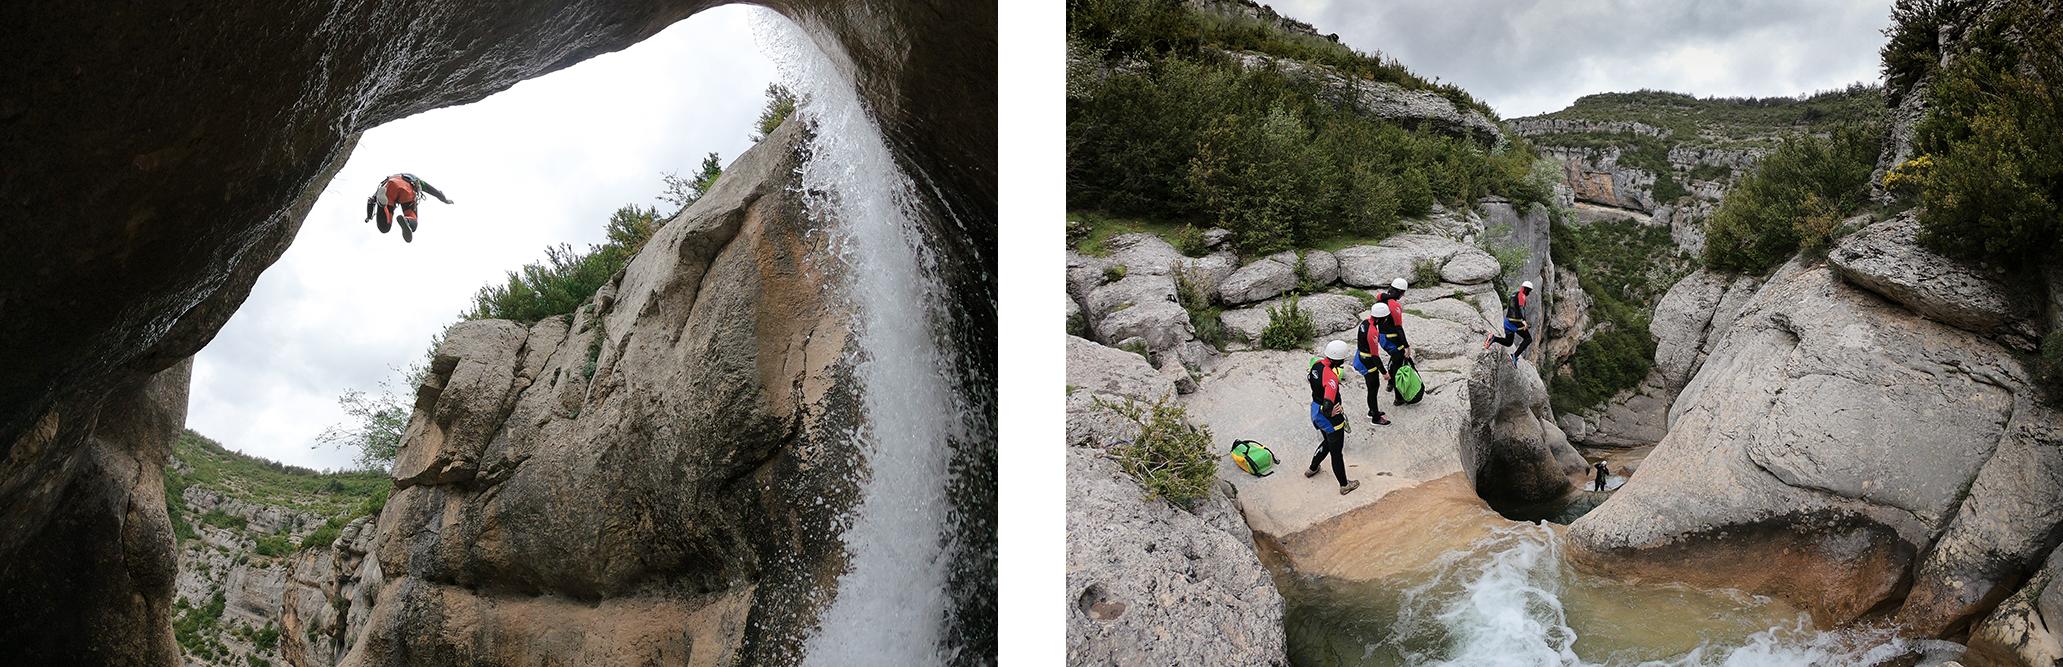 Canyoning Sierra de Guara Espagne